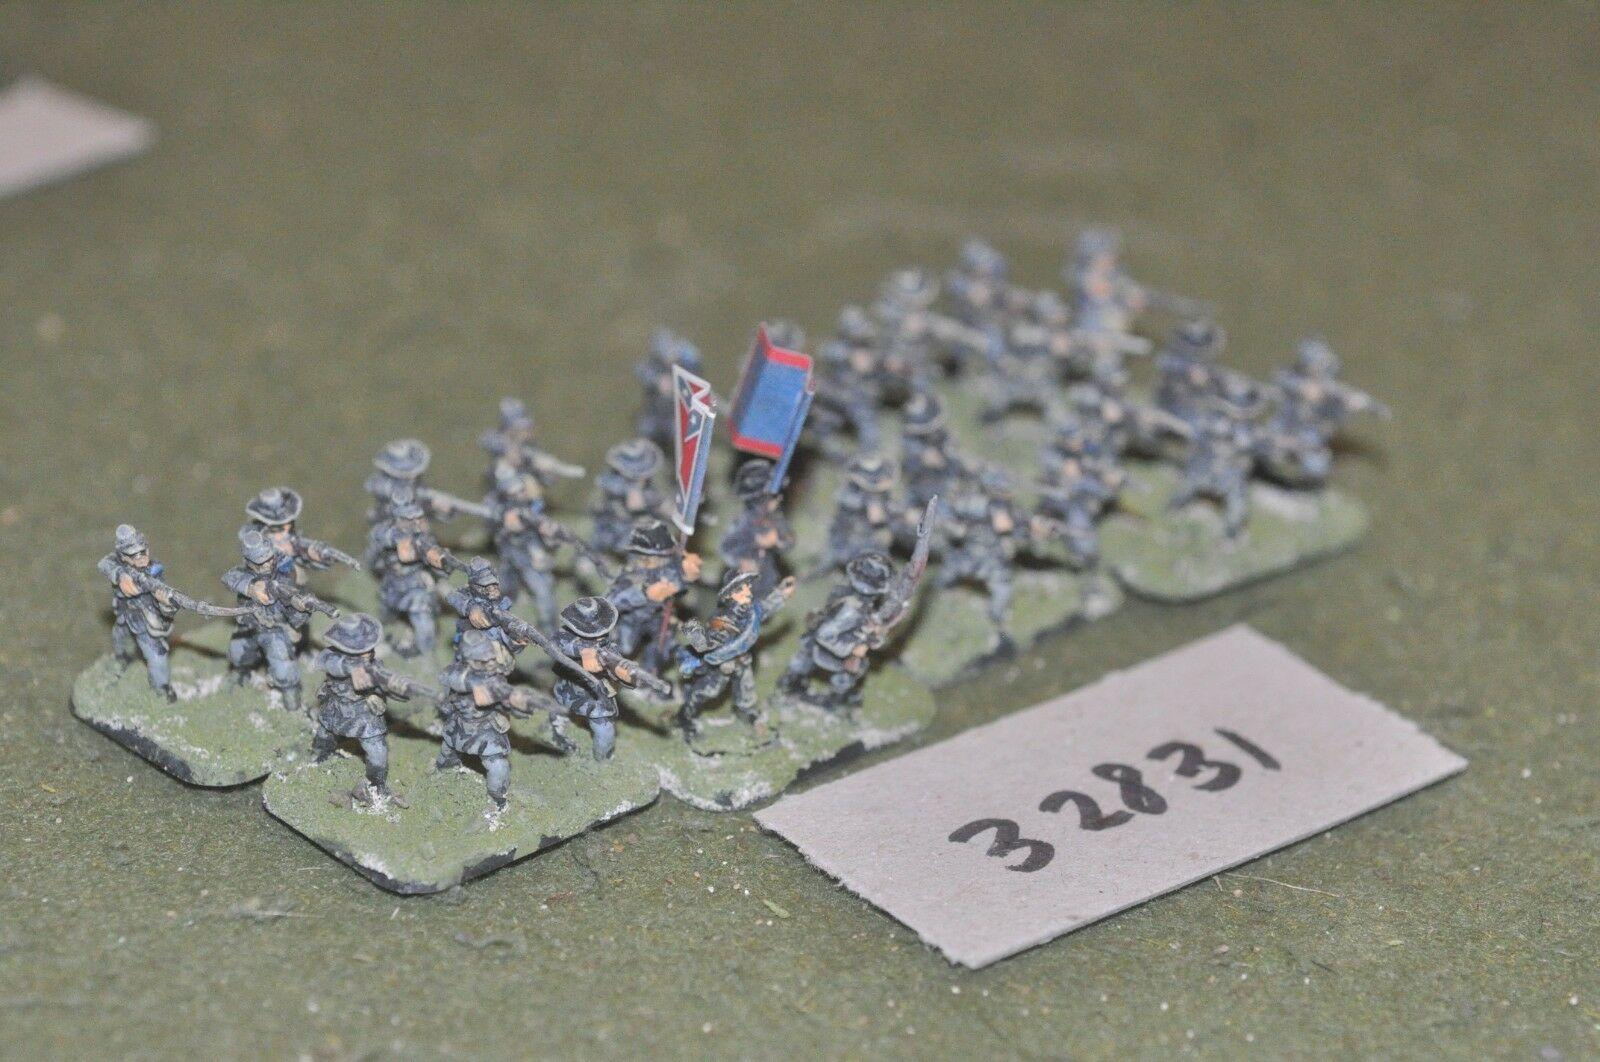 15mm ACW   confederate - regiment 32 figures - inf (32831)